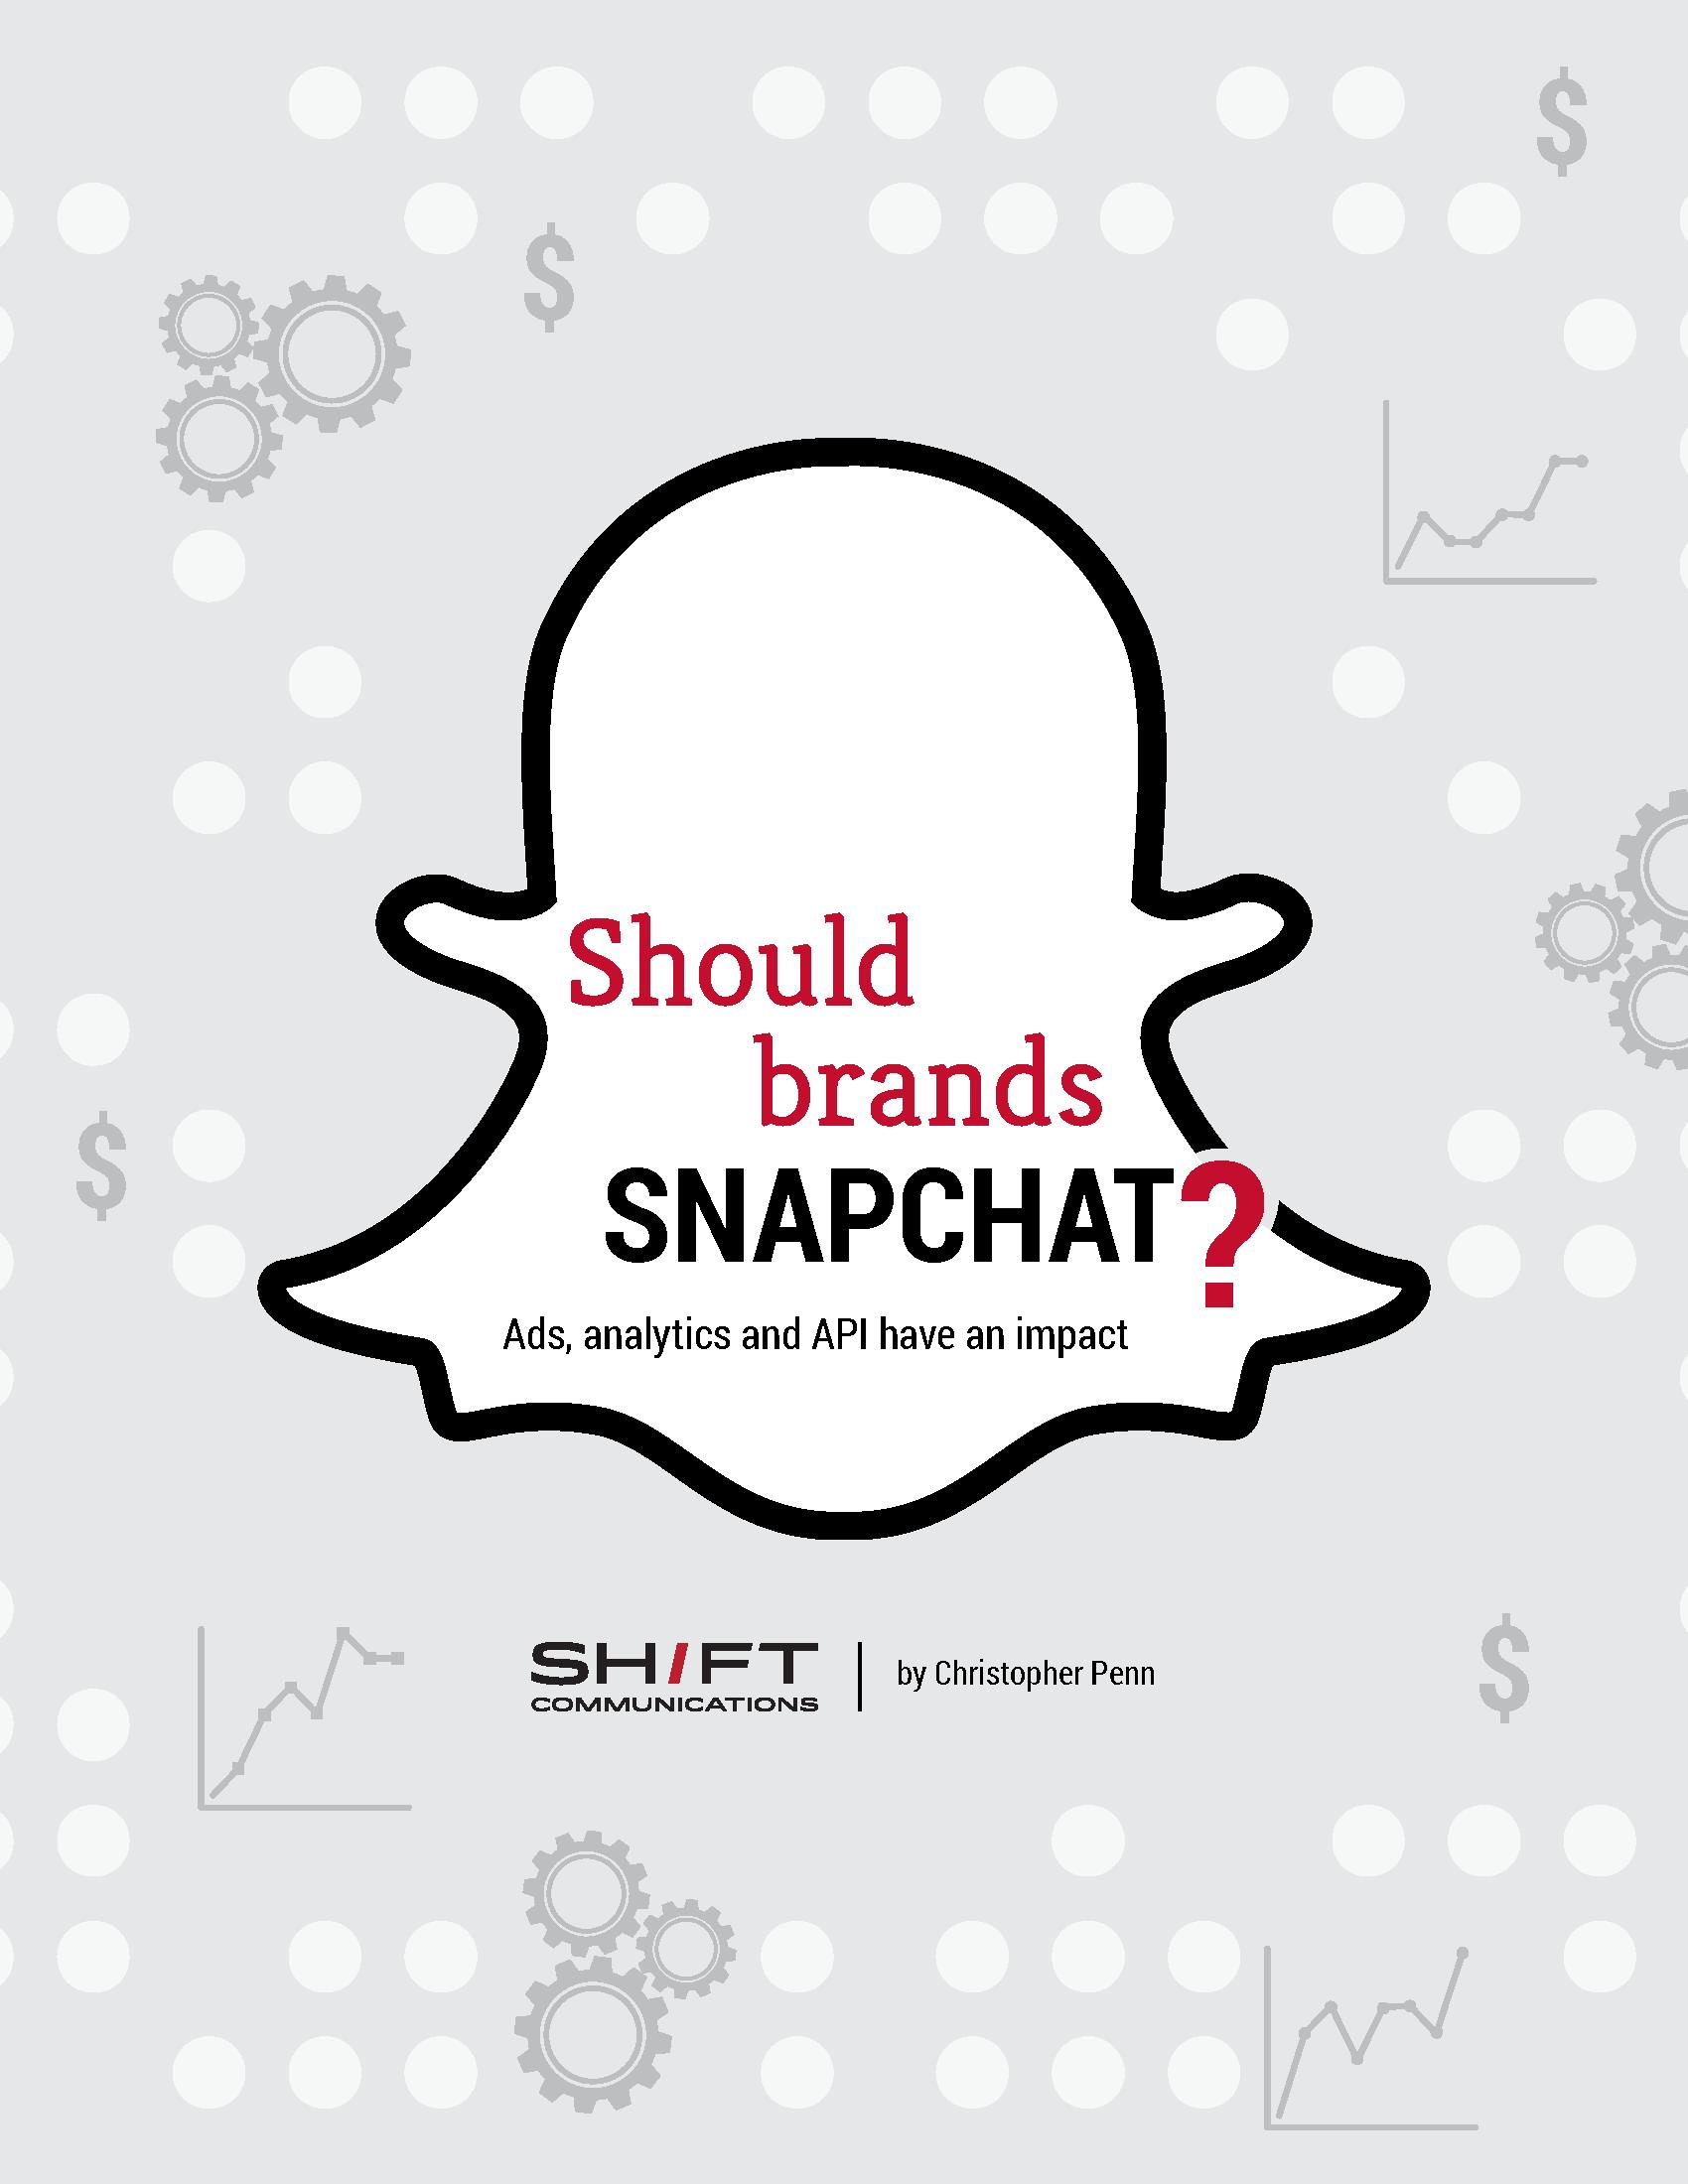 Should brands snapchat?